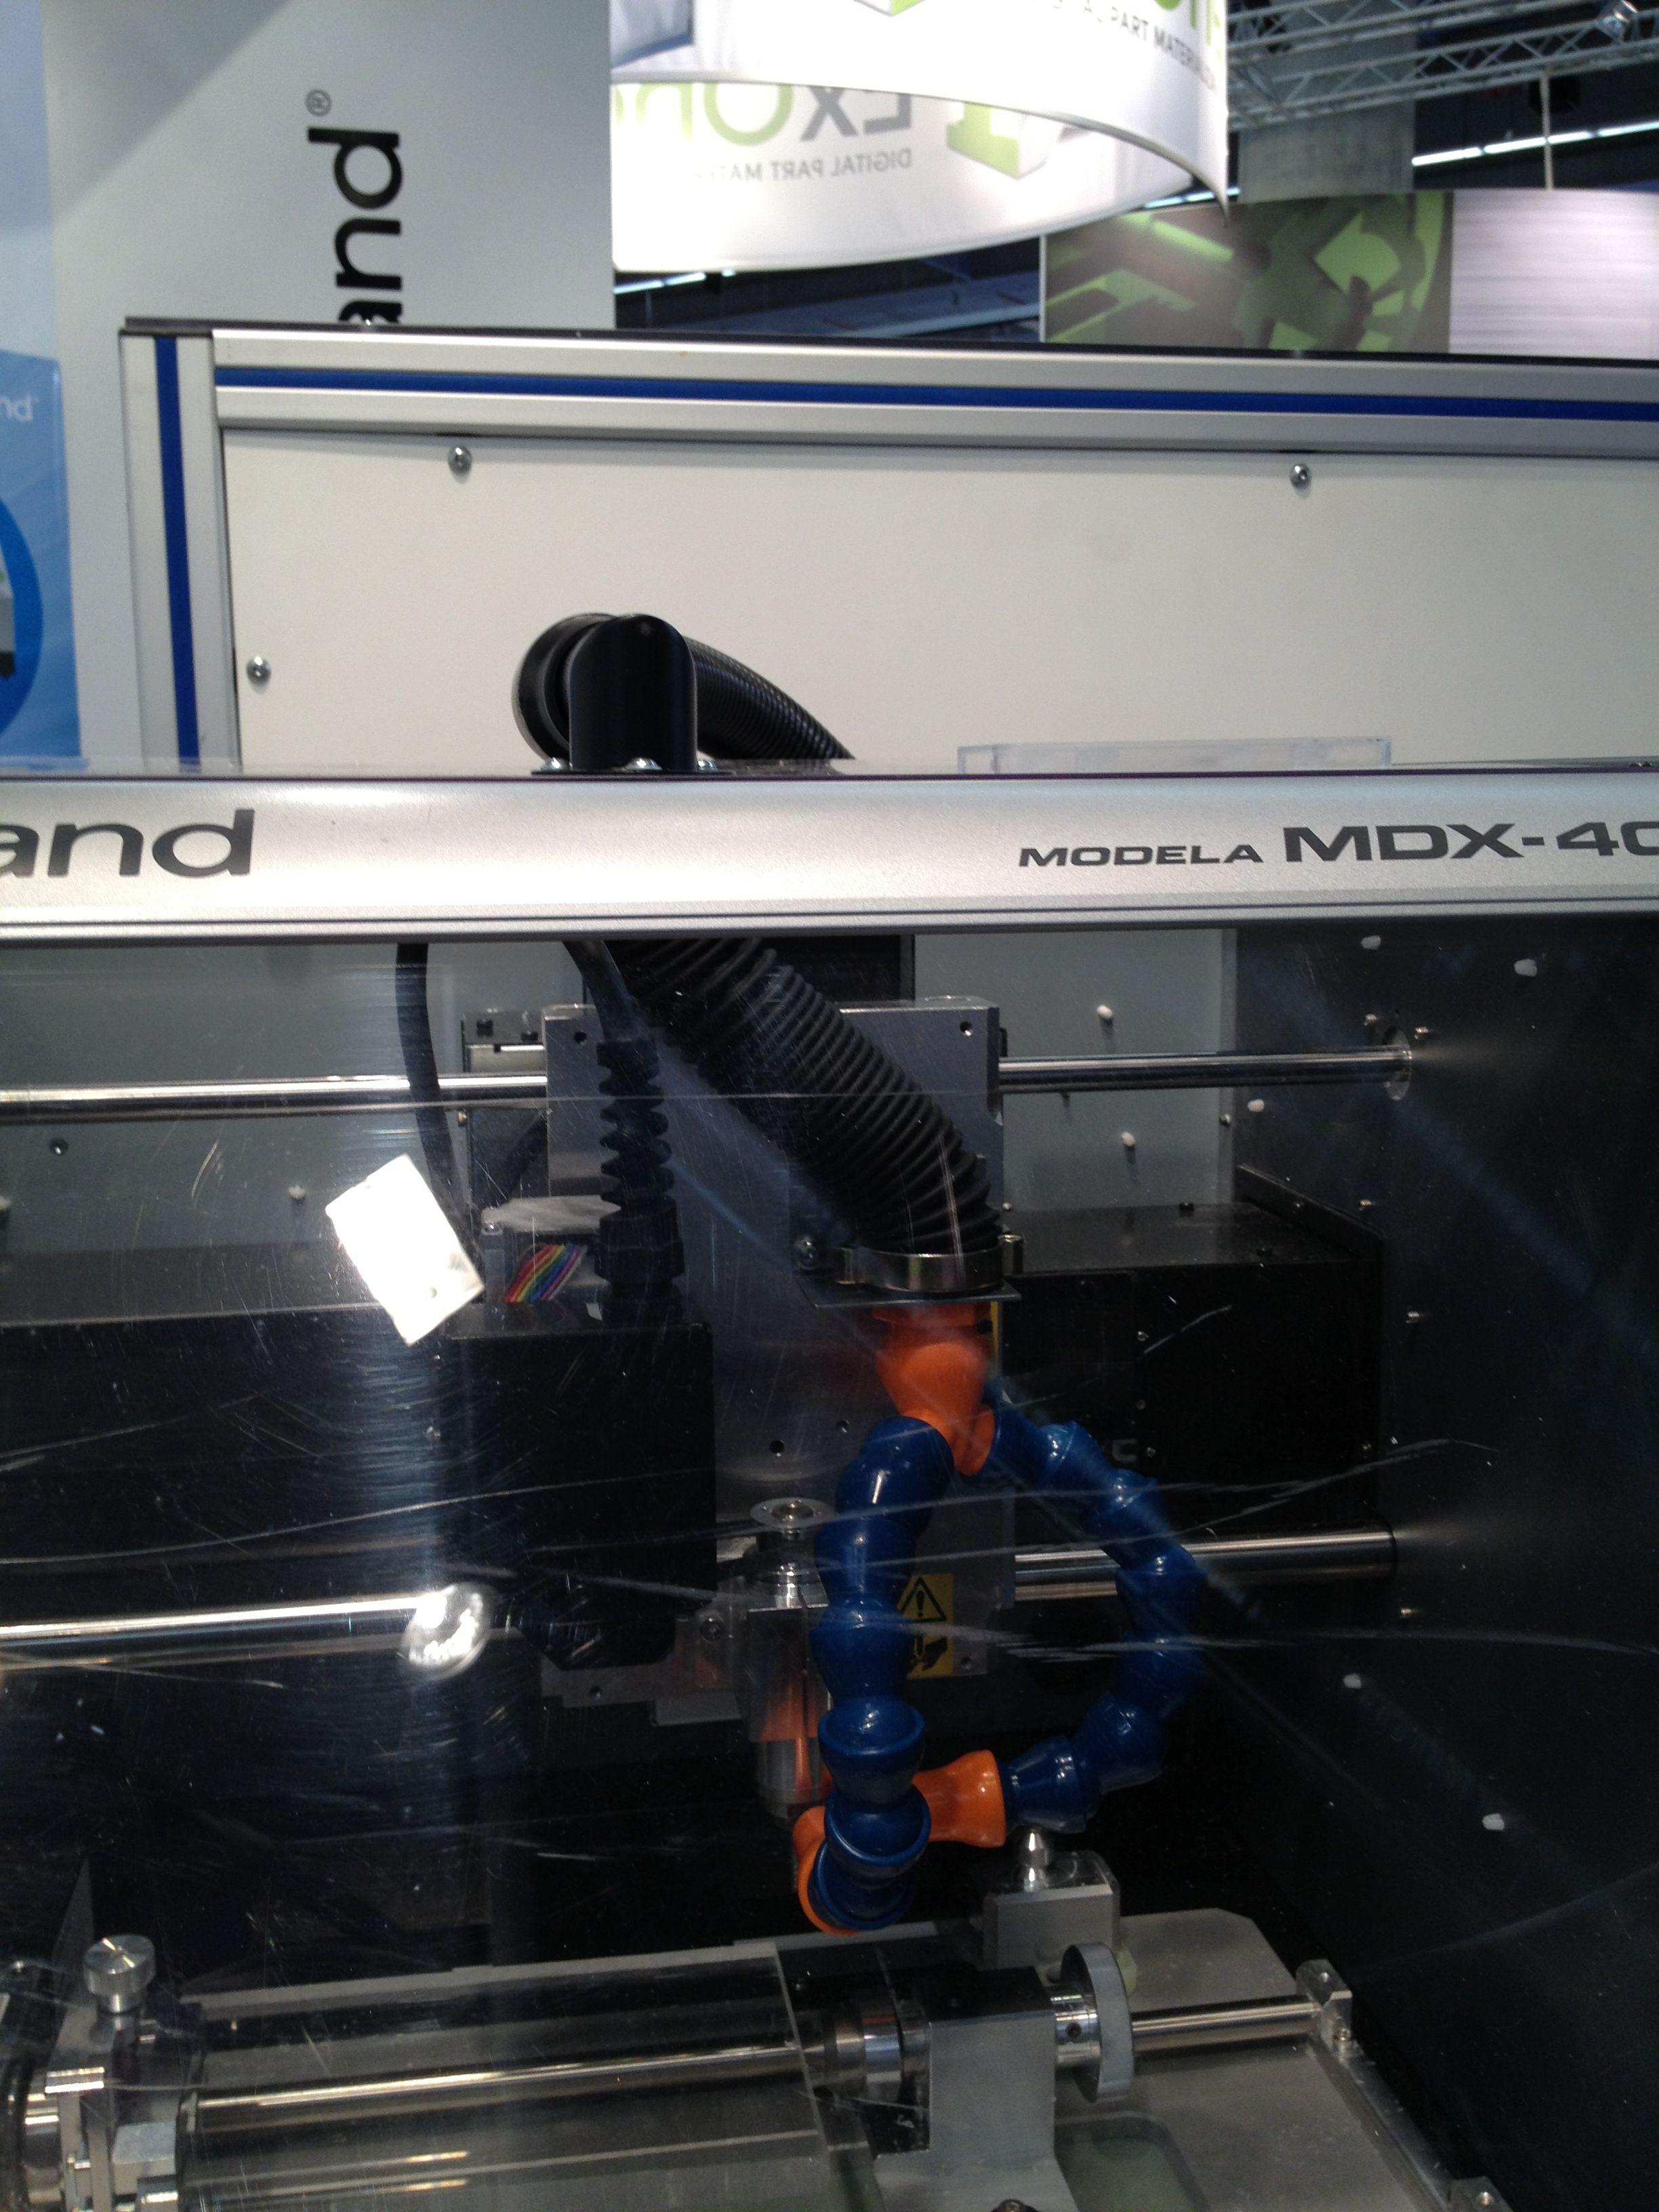 Roland MDX-40A CNC-jyrsinkoneen katosta läpi viety imuriletku Frankfurtissa EuroMold messuilla marraskuussa 2012.